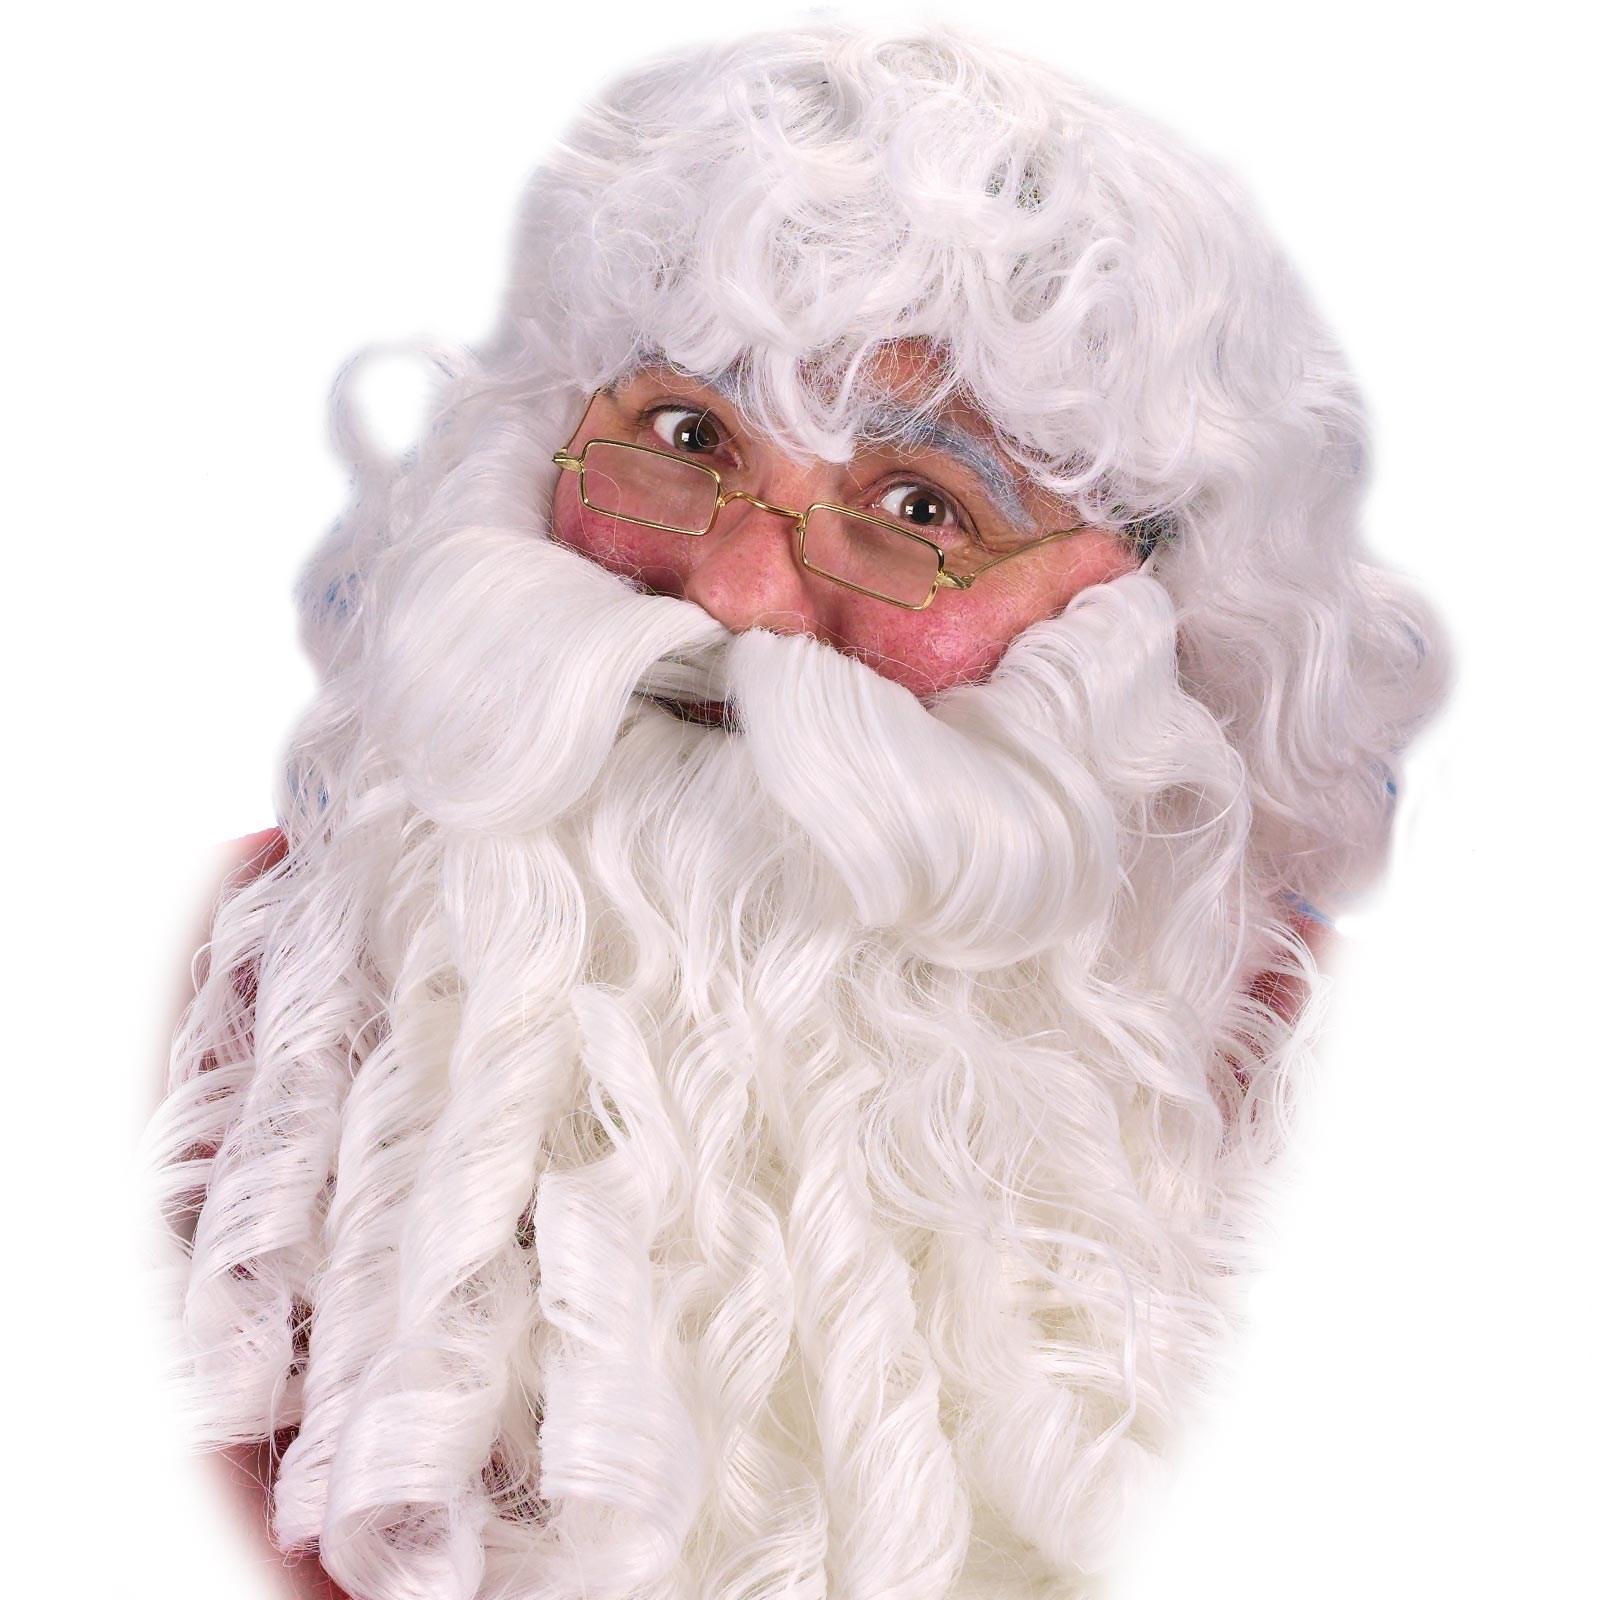 Deluxe Santa Wig  Beard and Eyebrows Set